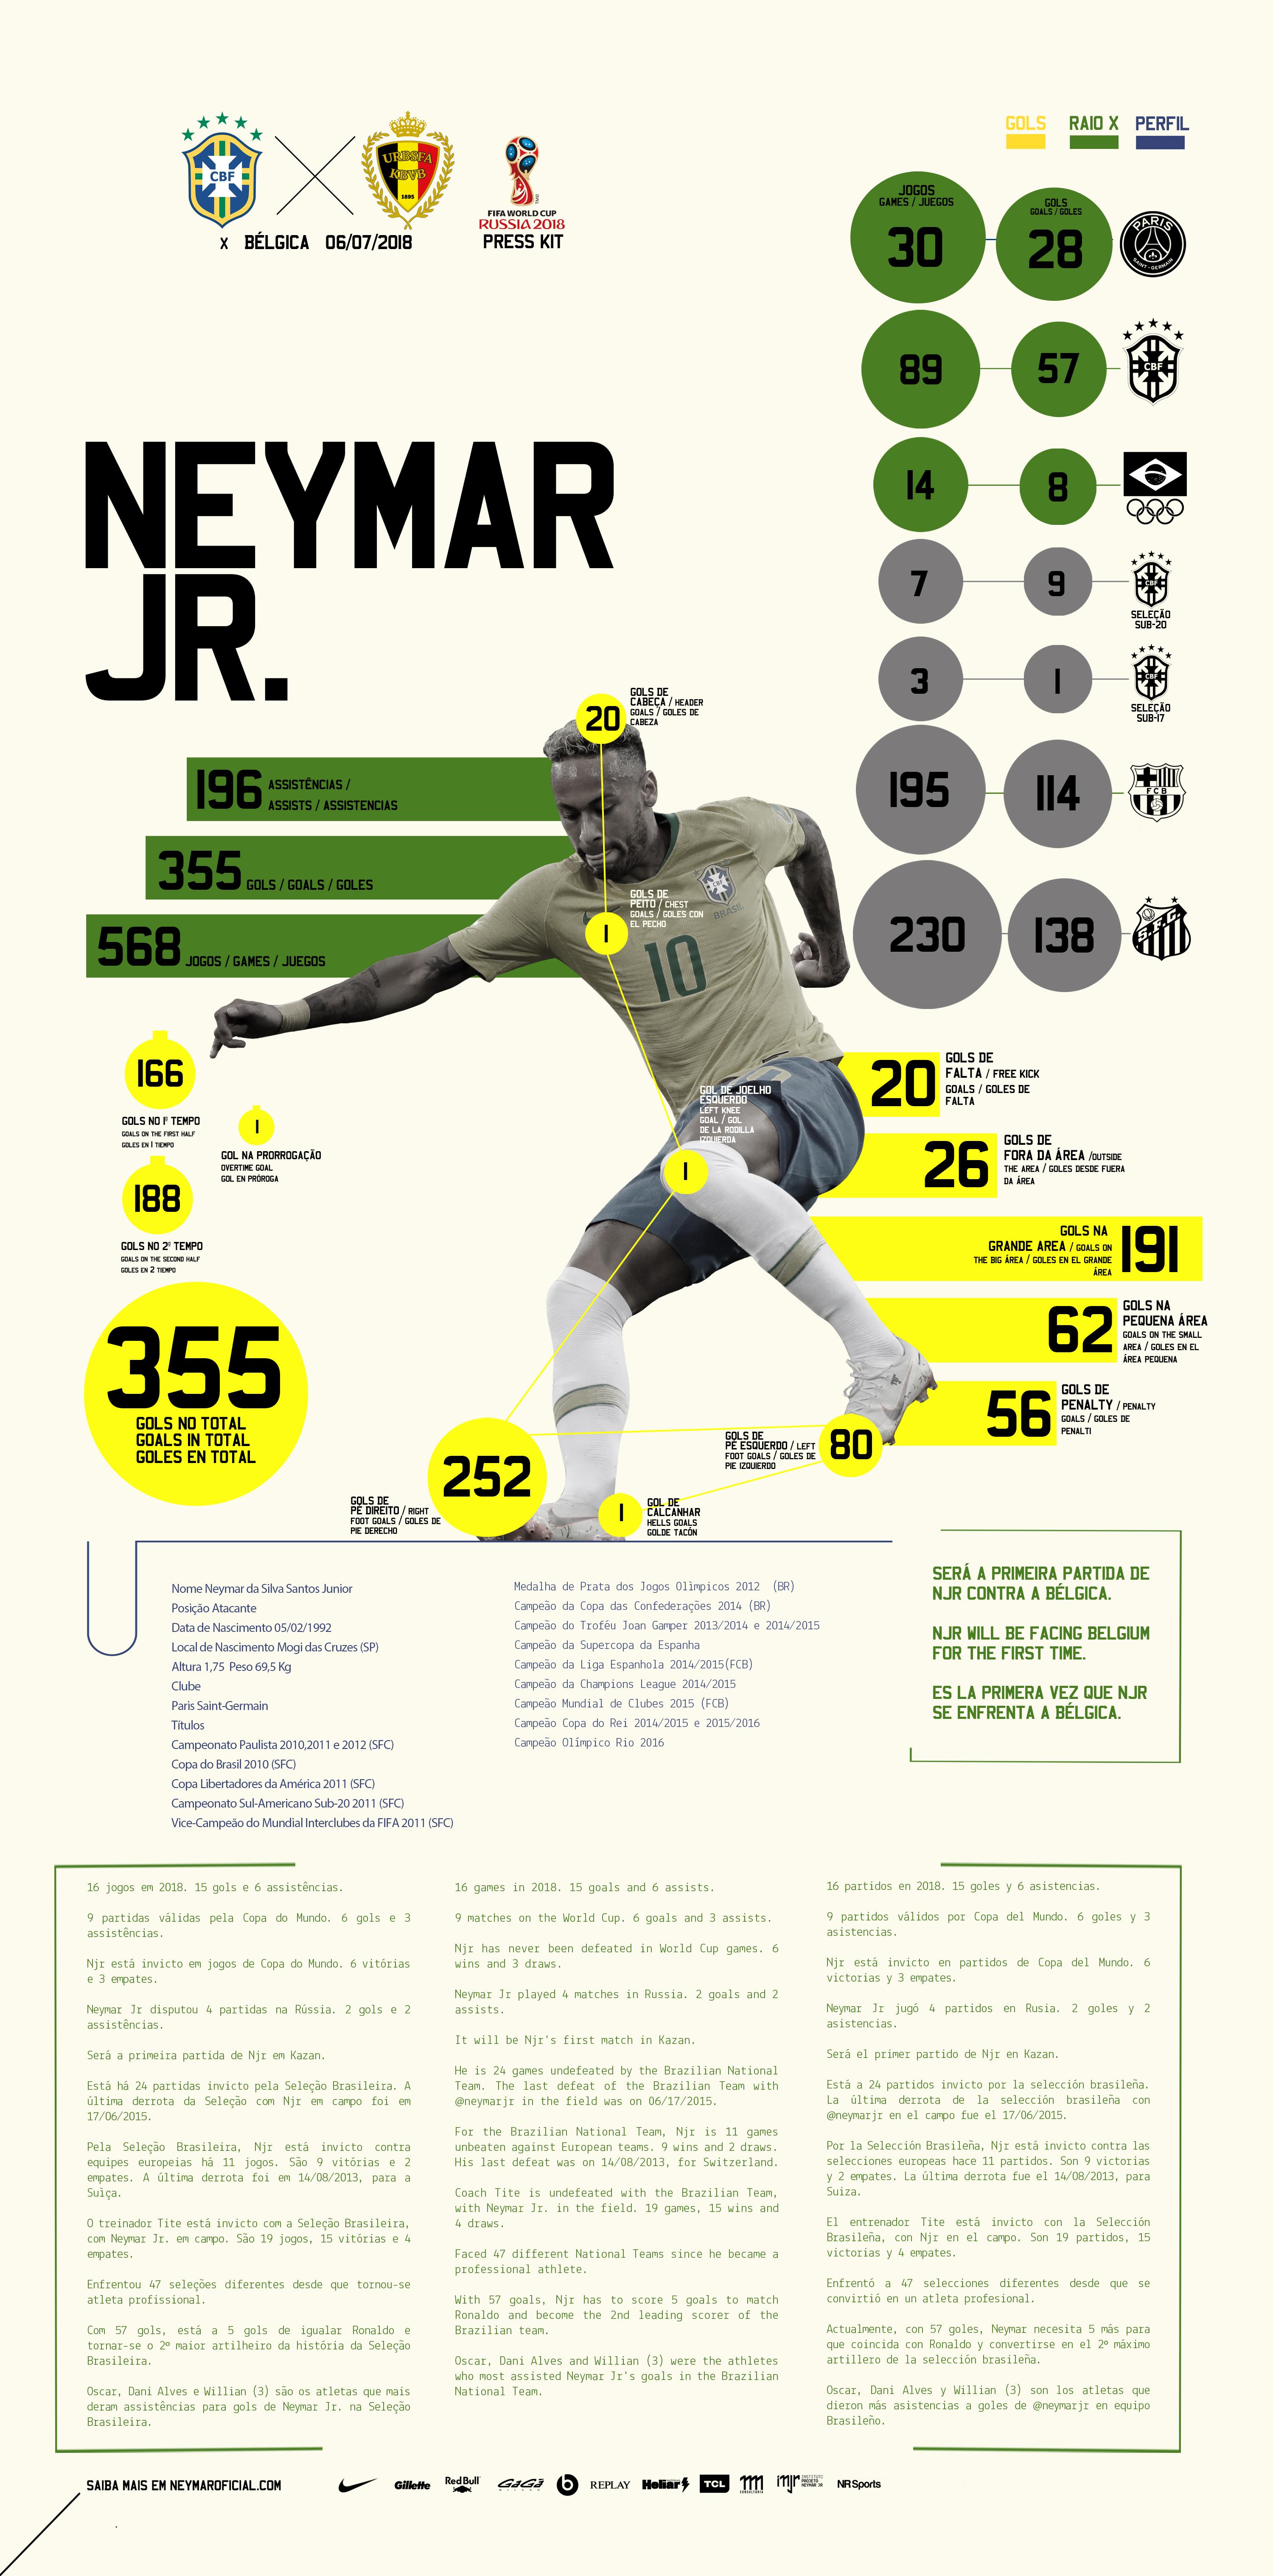 Neymar Jr. d60ab160700c0